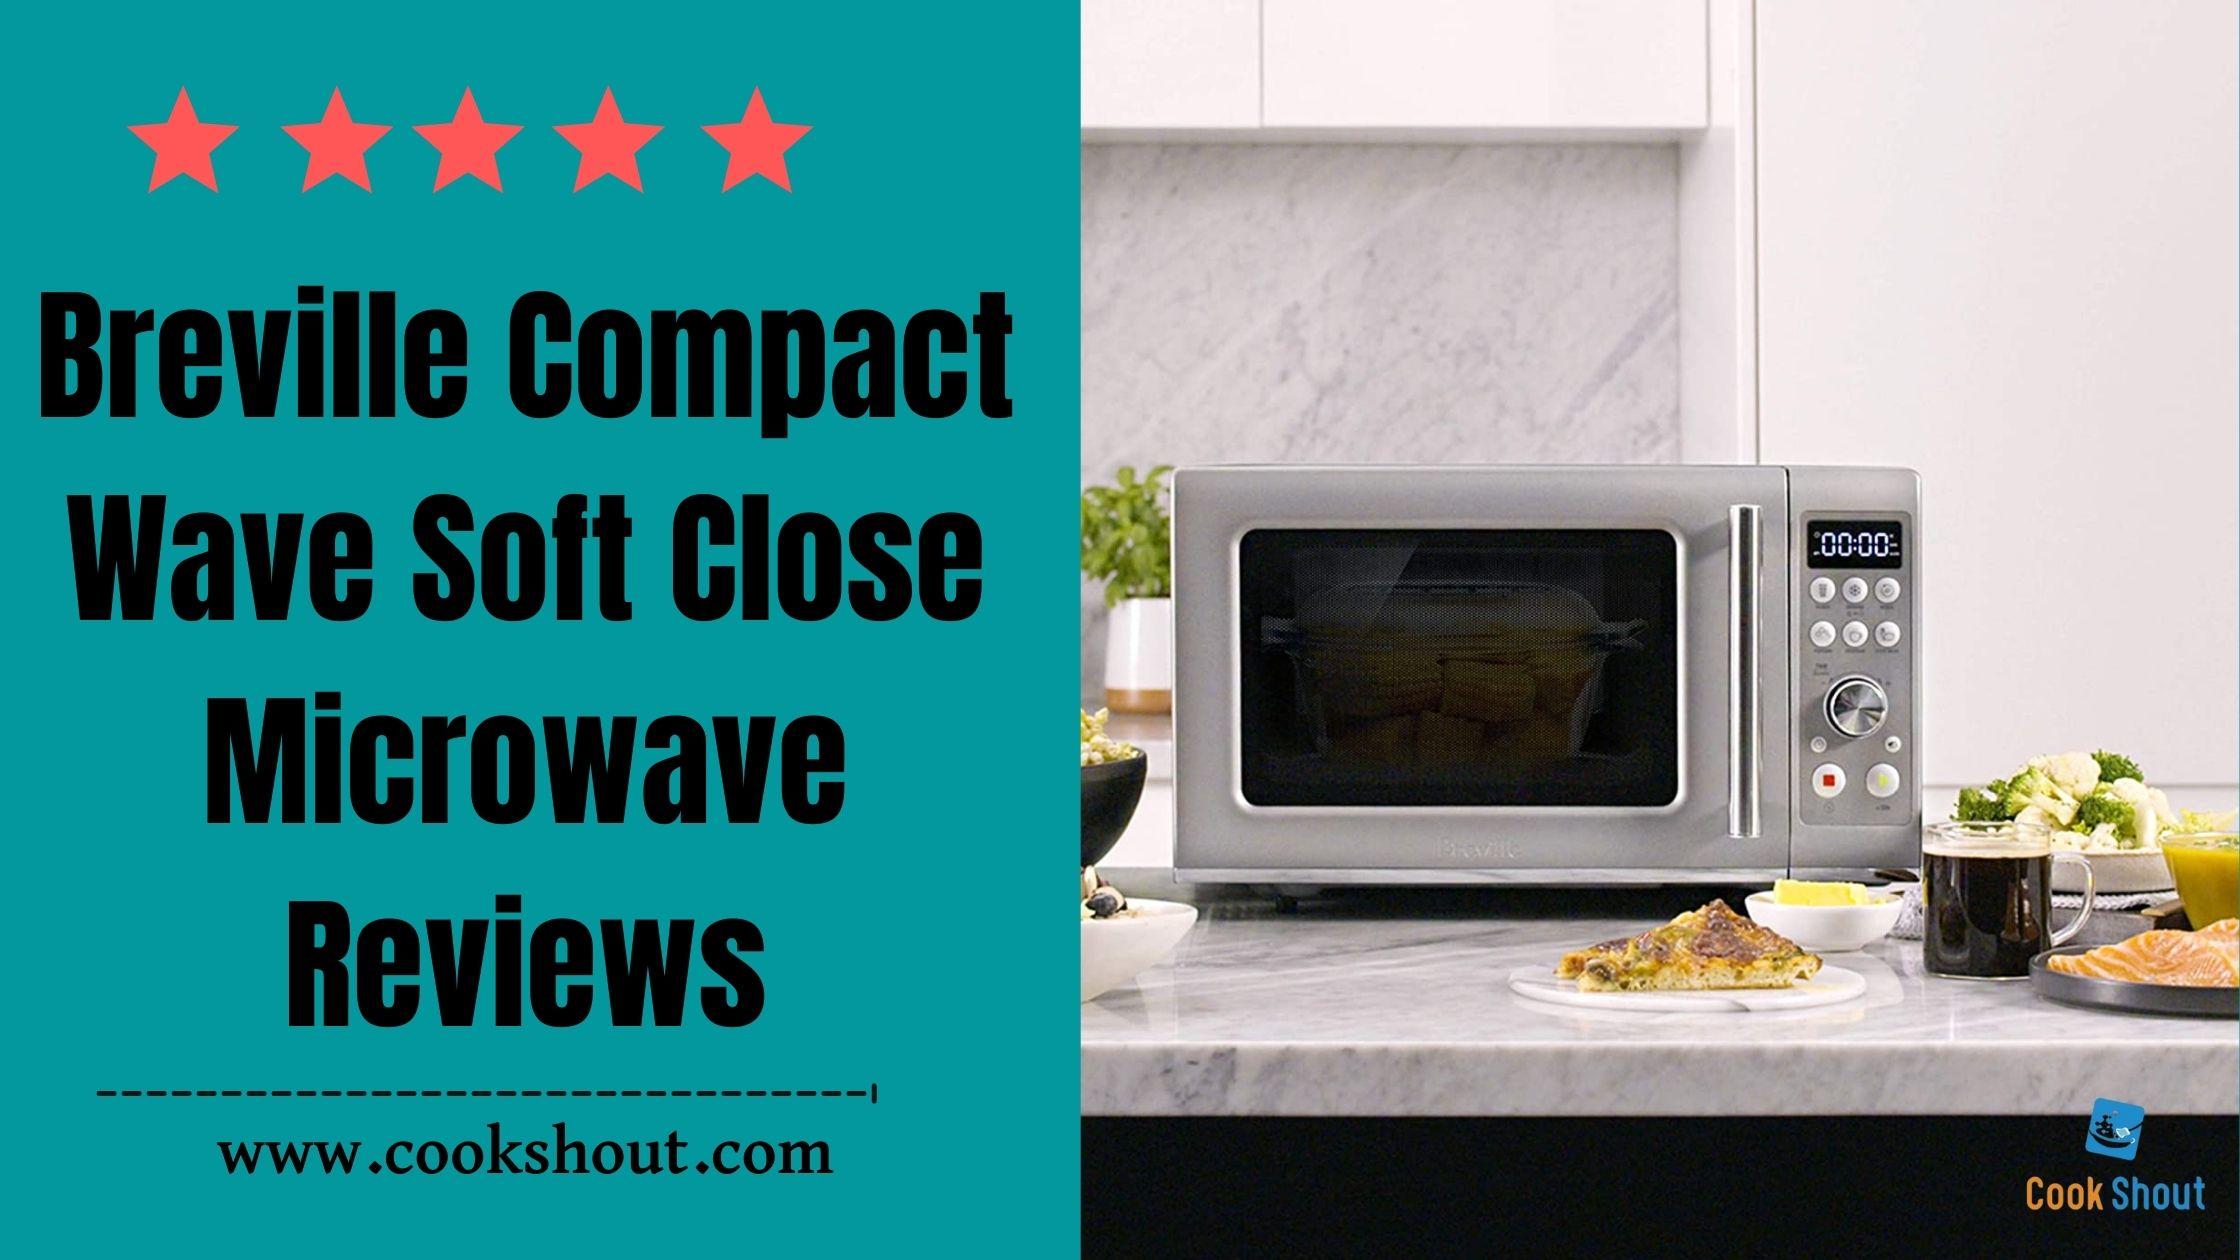 Breville Compact Wave Soft Close Microwave Reviews